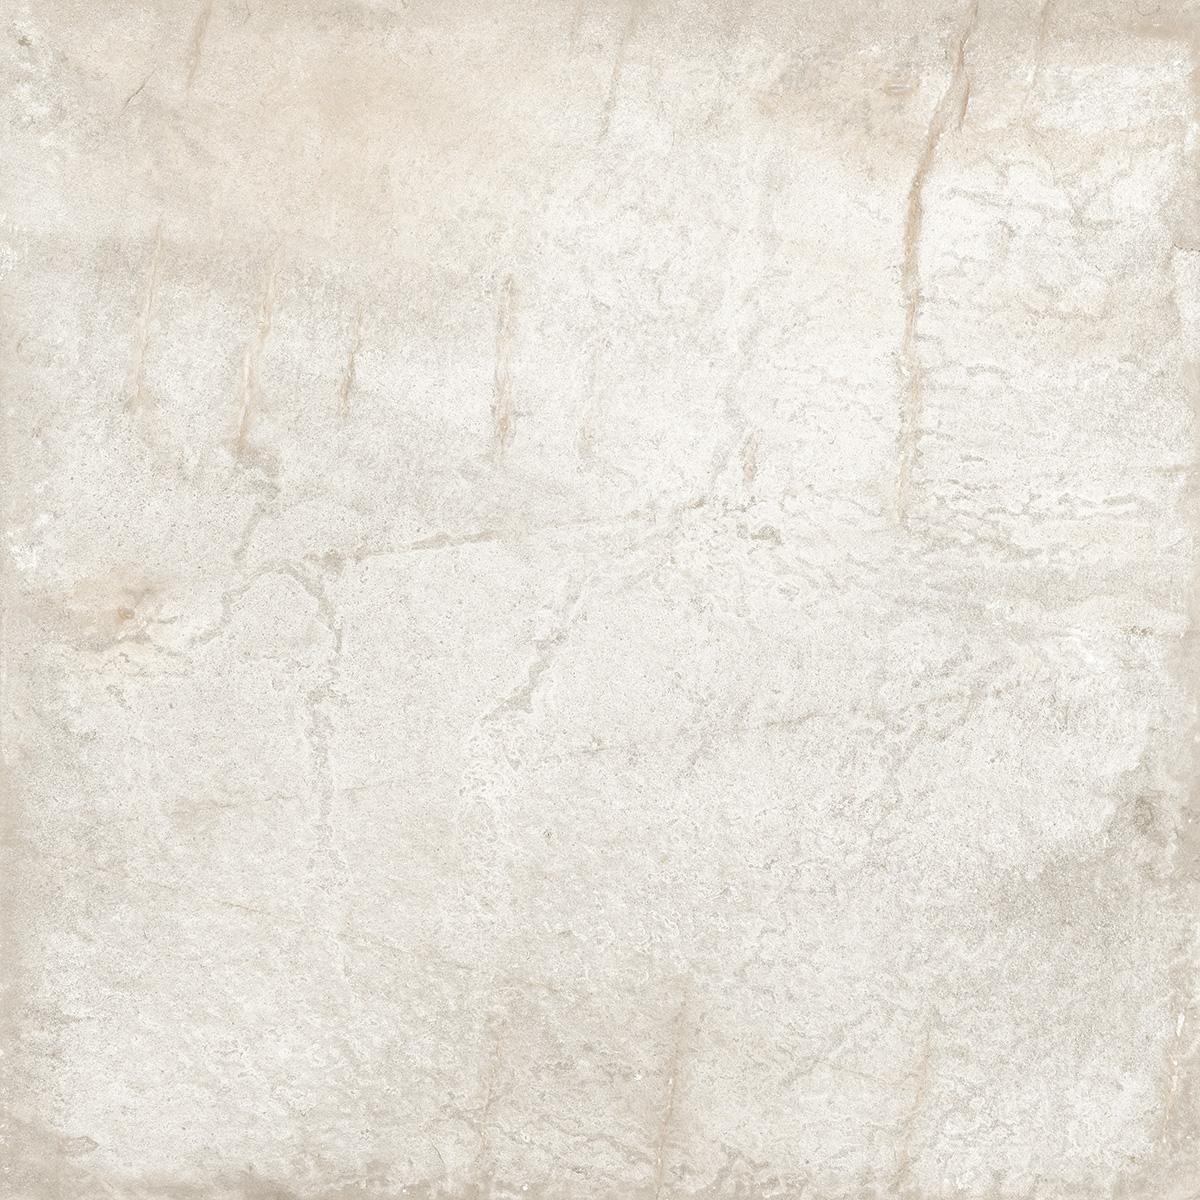 Delconca HCL2 Climb Bianco